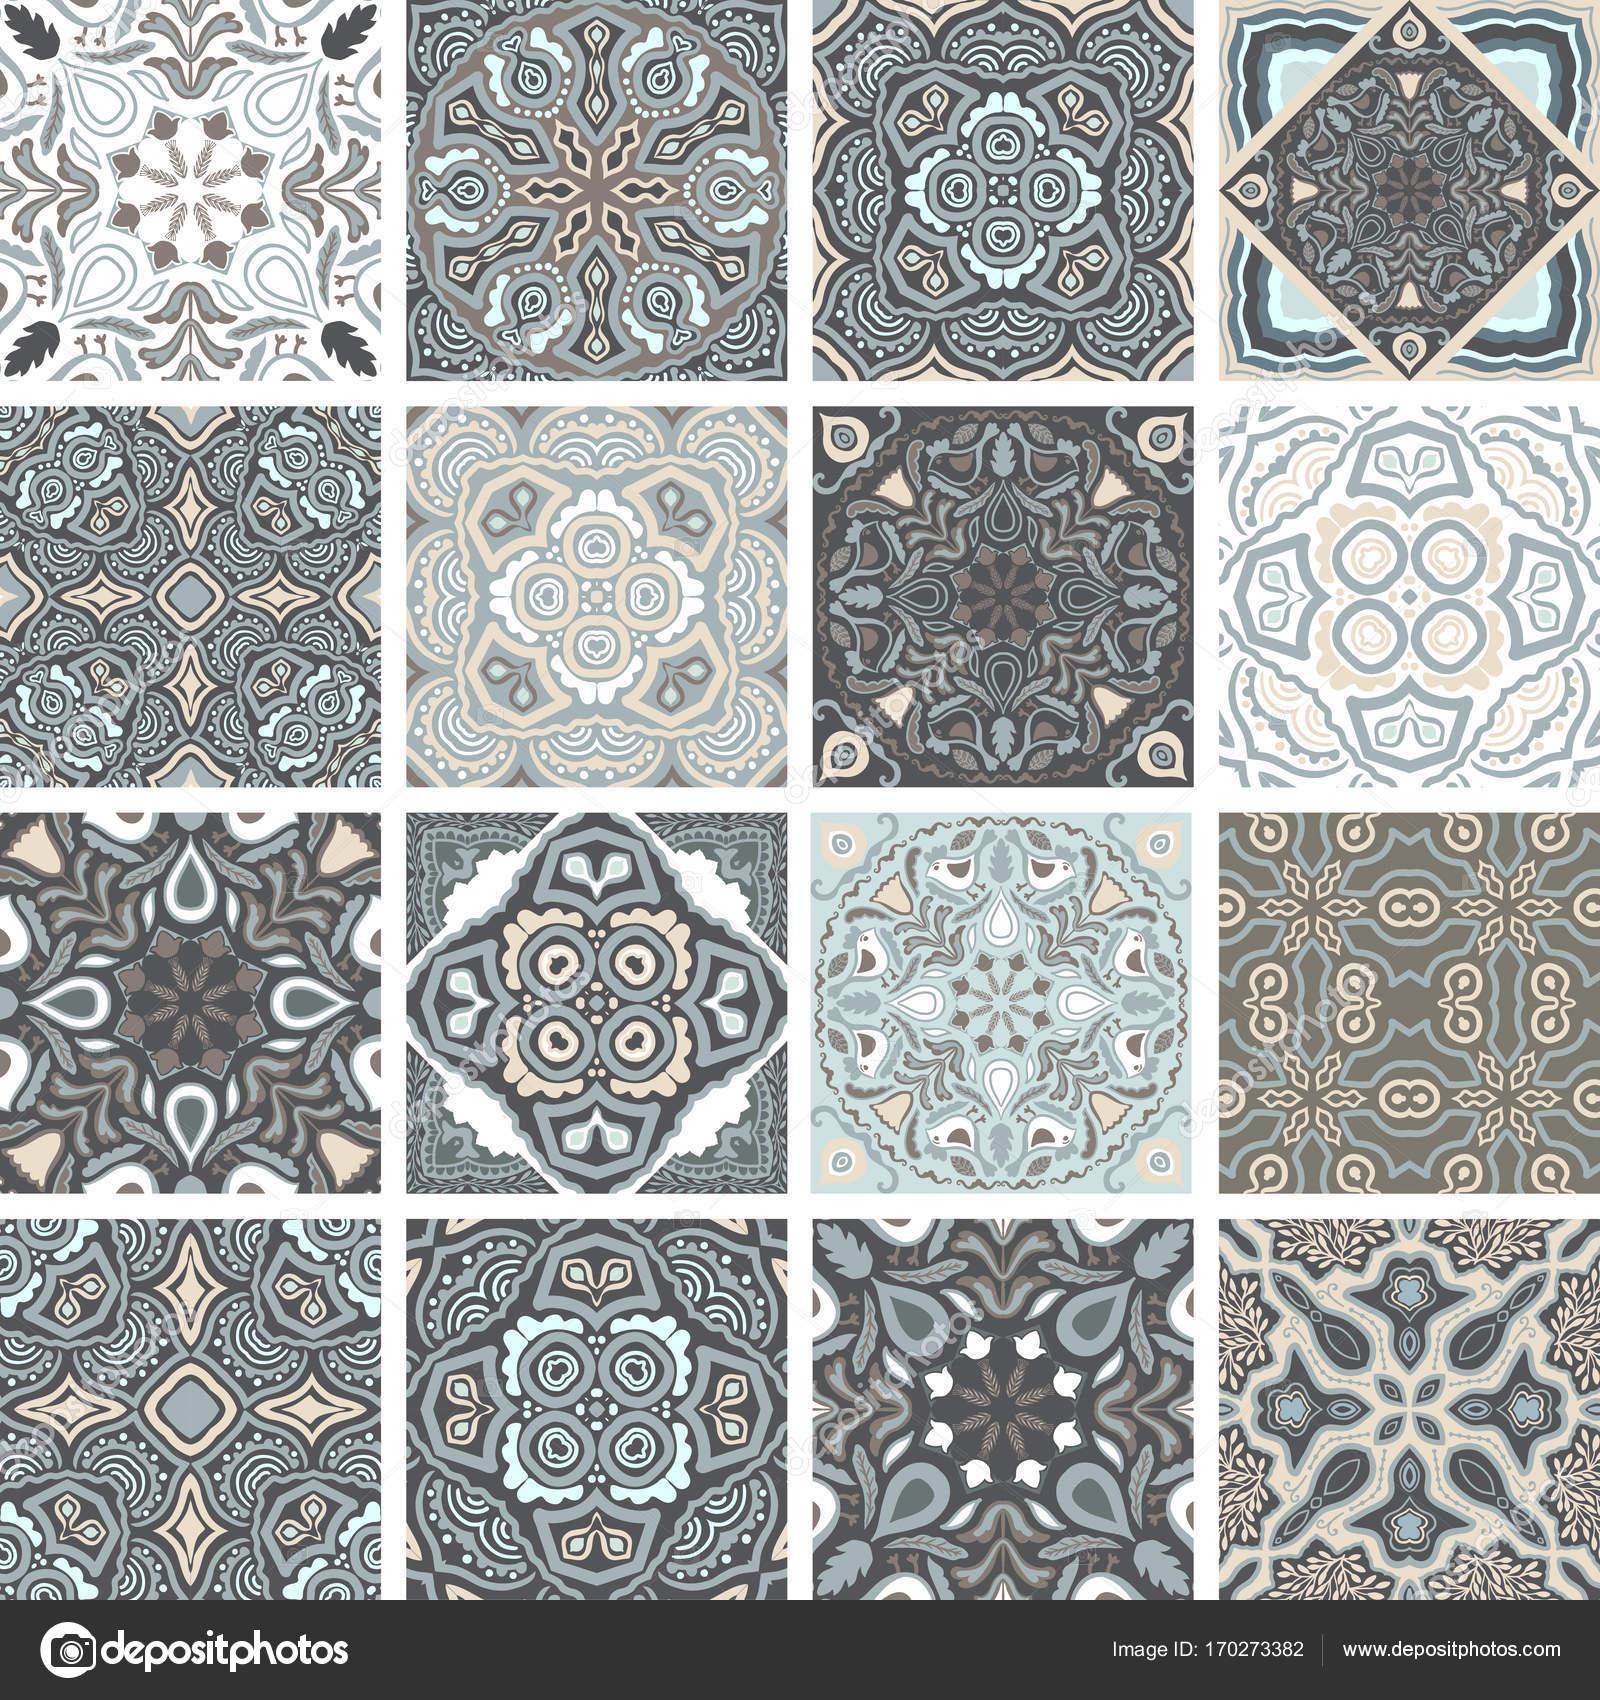 patterned flower modern floor vintage tiles stock decor ceramic decorative wall illustration download texture and